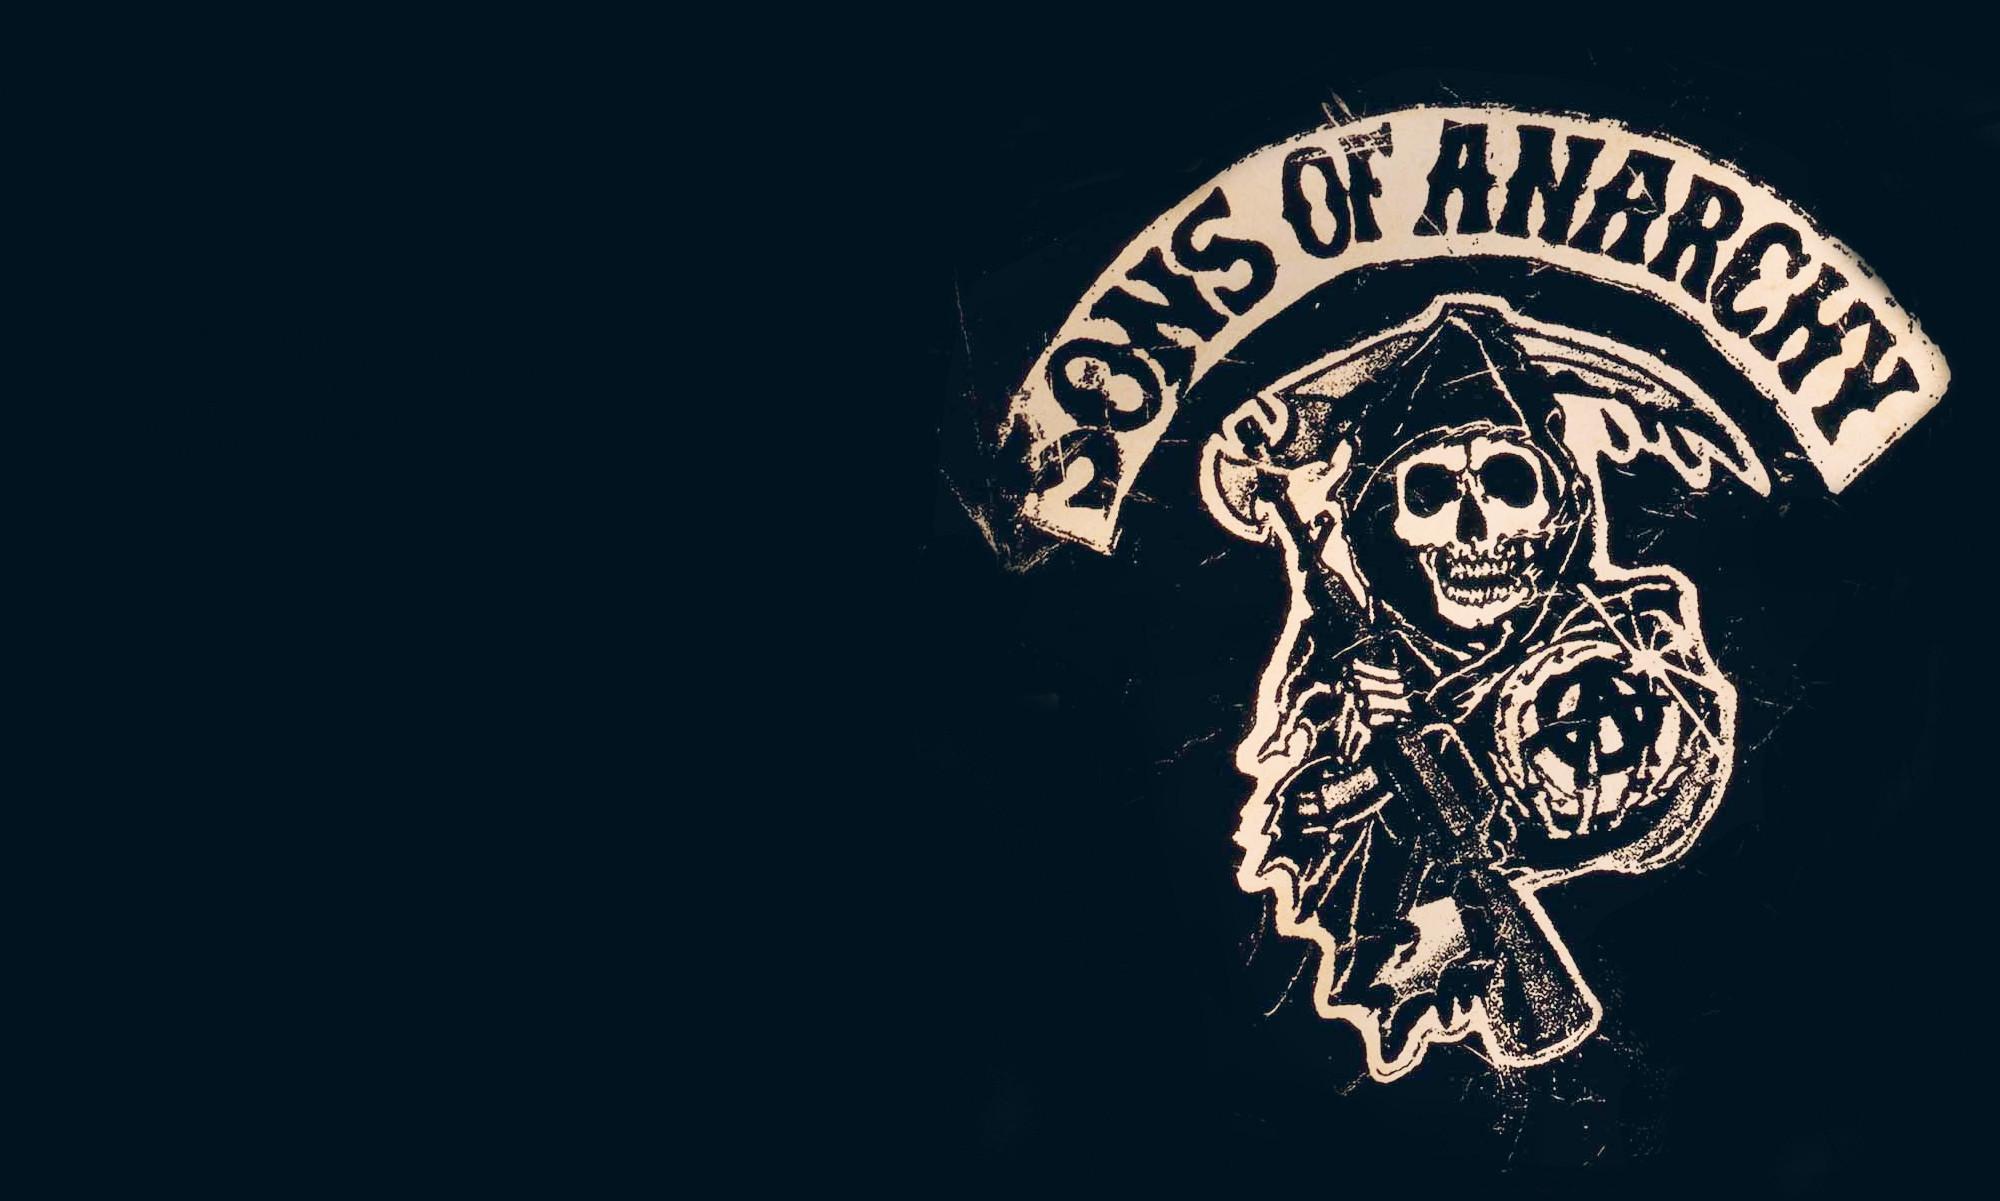 Sons of Anarchy Desktop